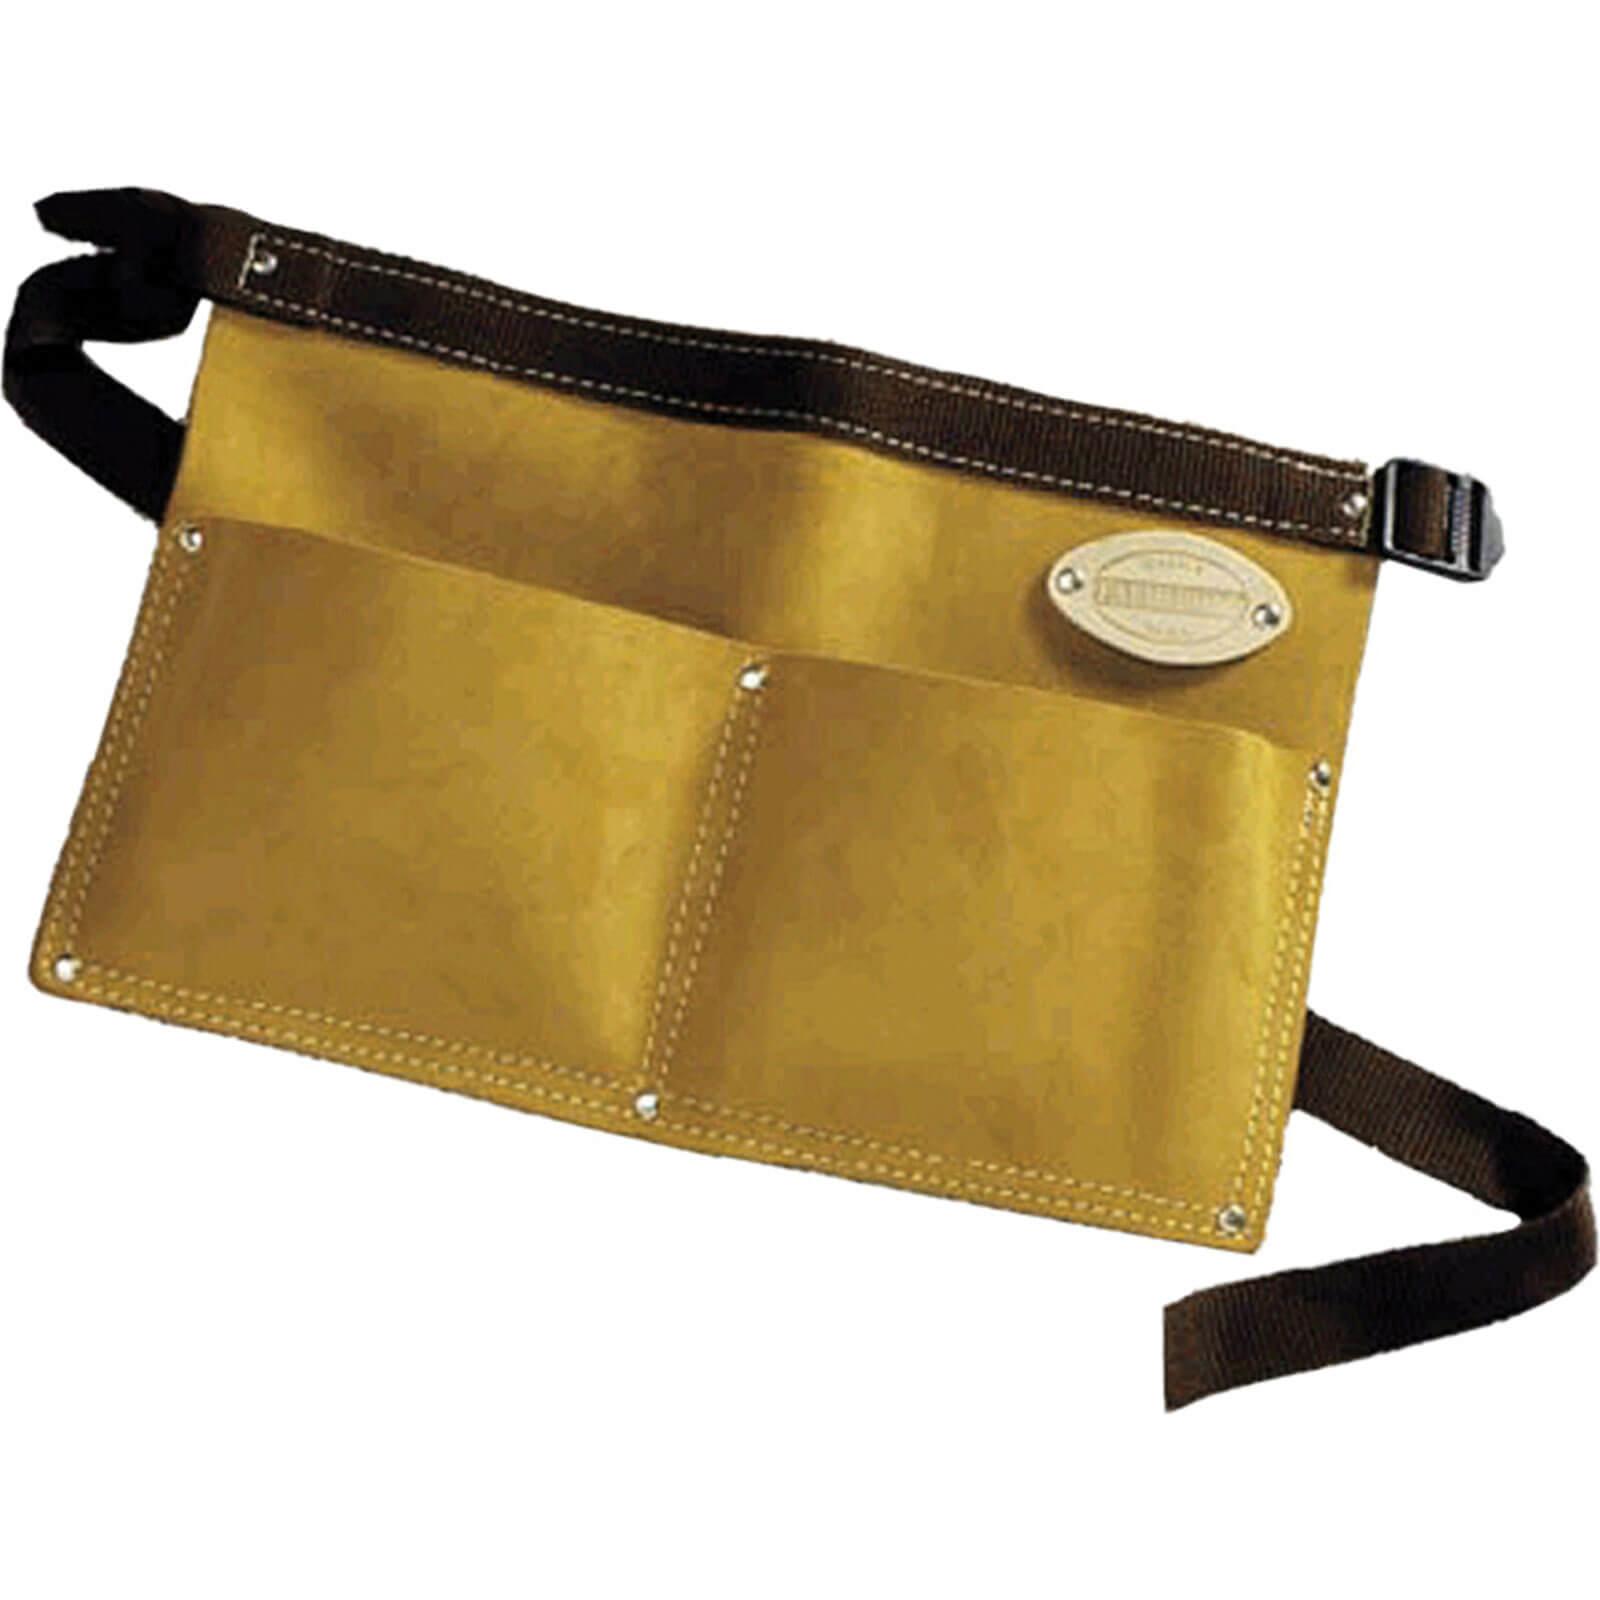 Faithfull Double Pocket Leather Nail pouch